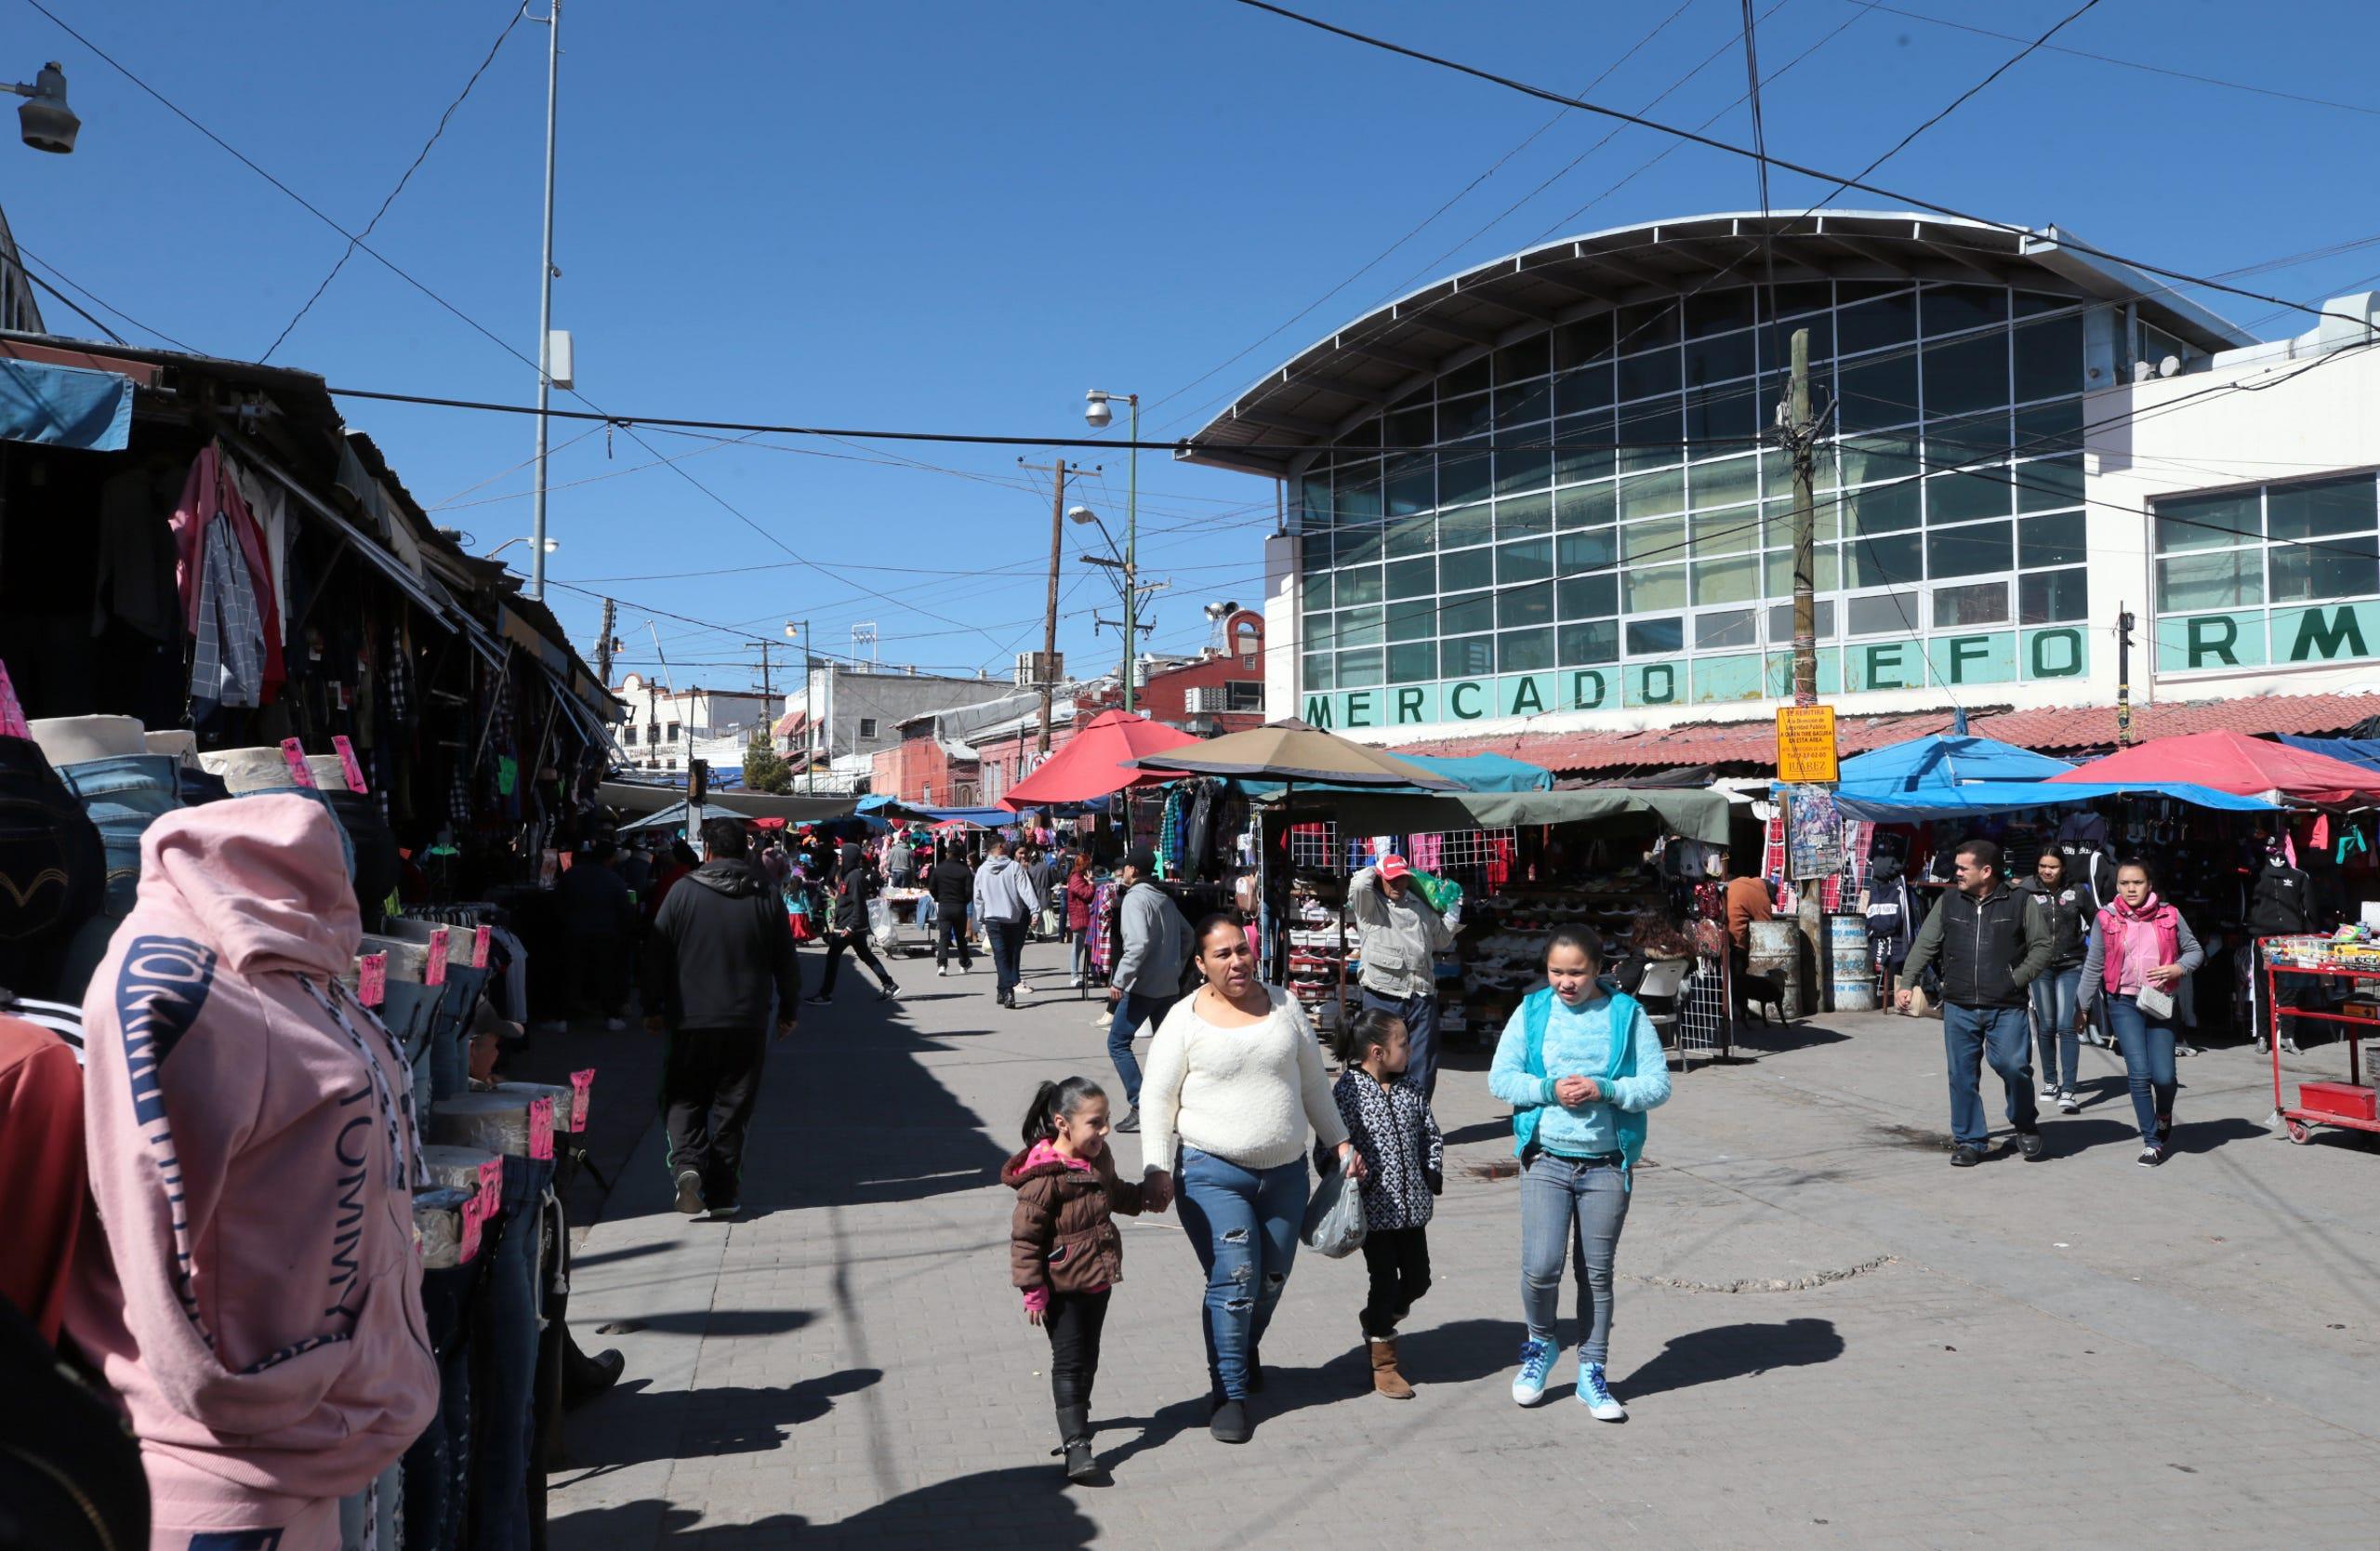 On Texas border, Ciudad Juarez, world's former murder capital, sees